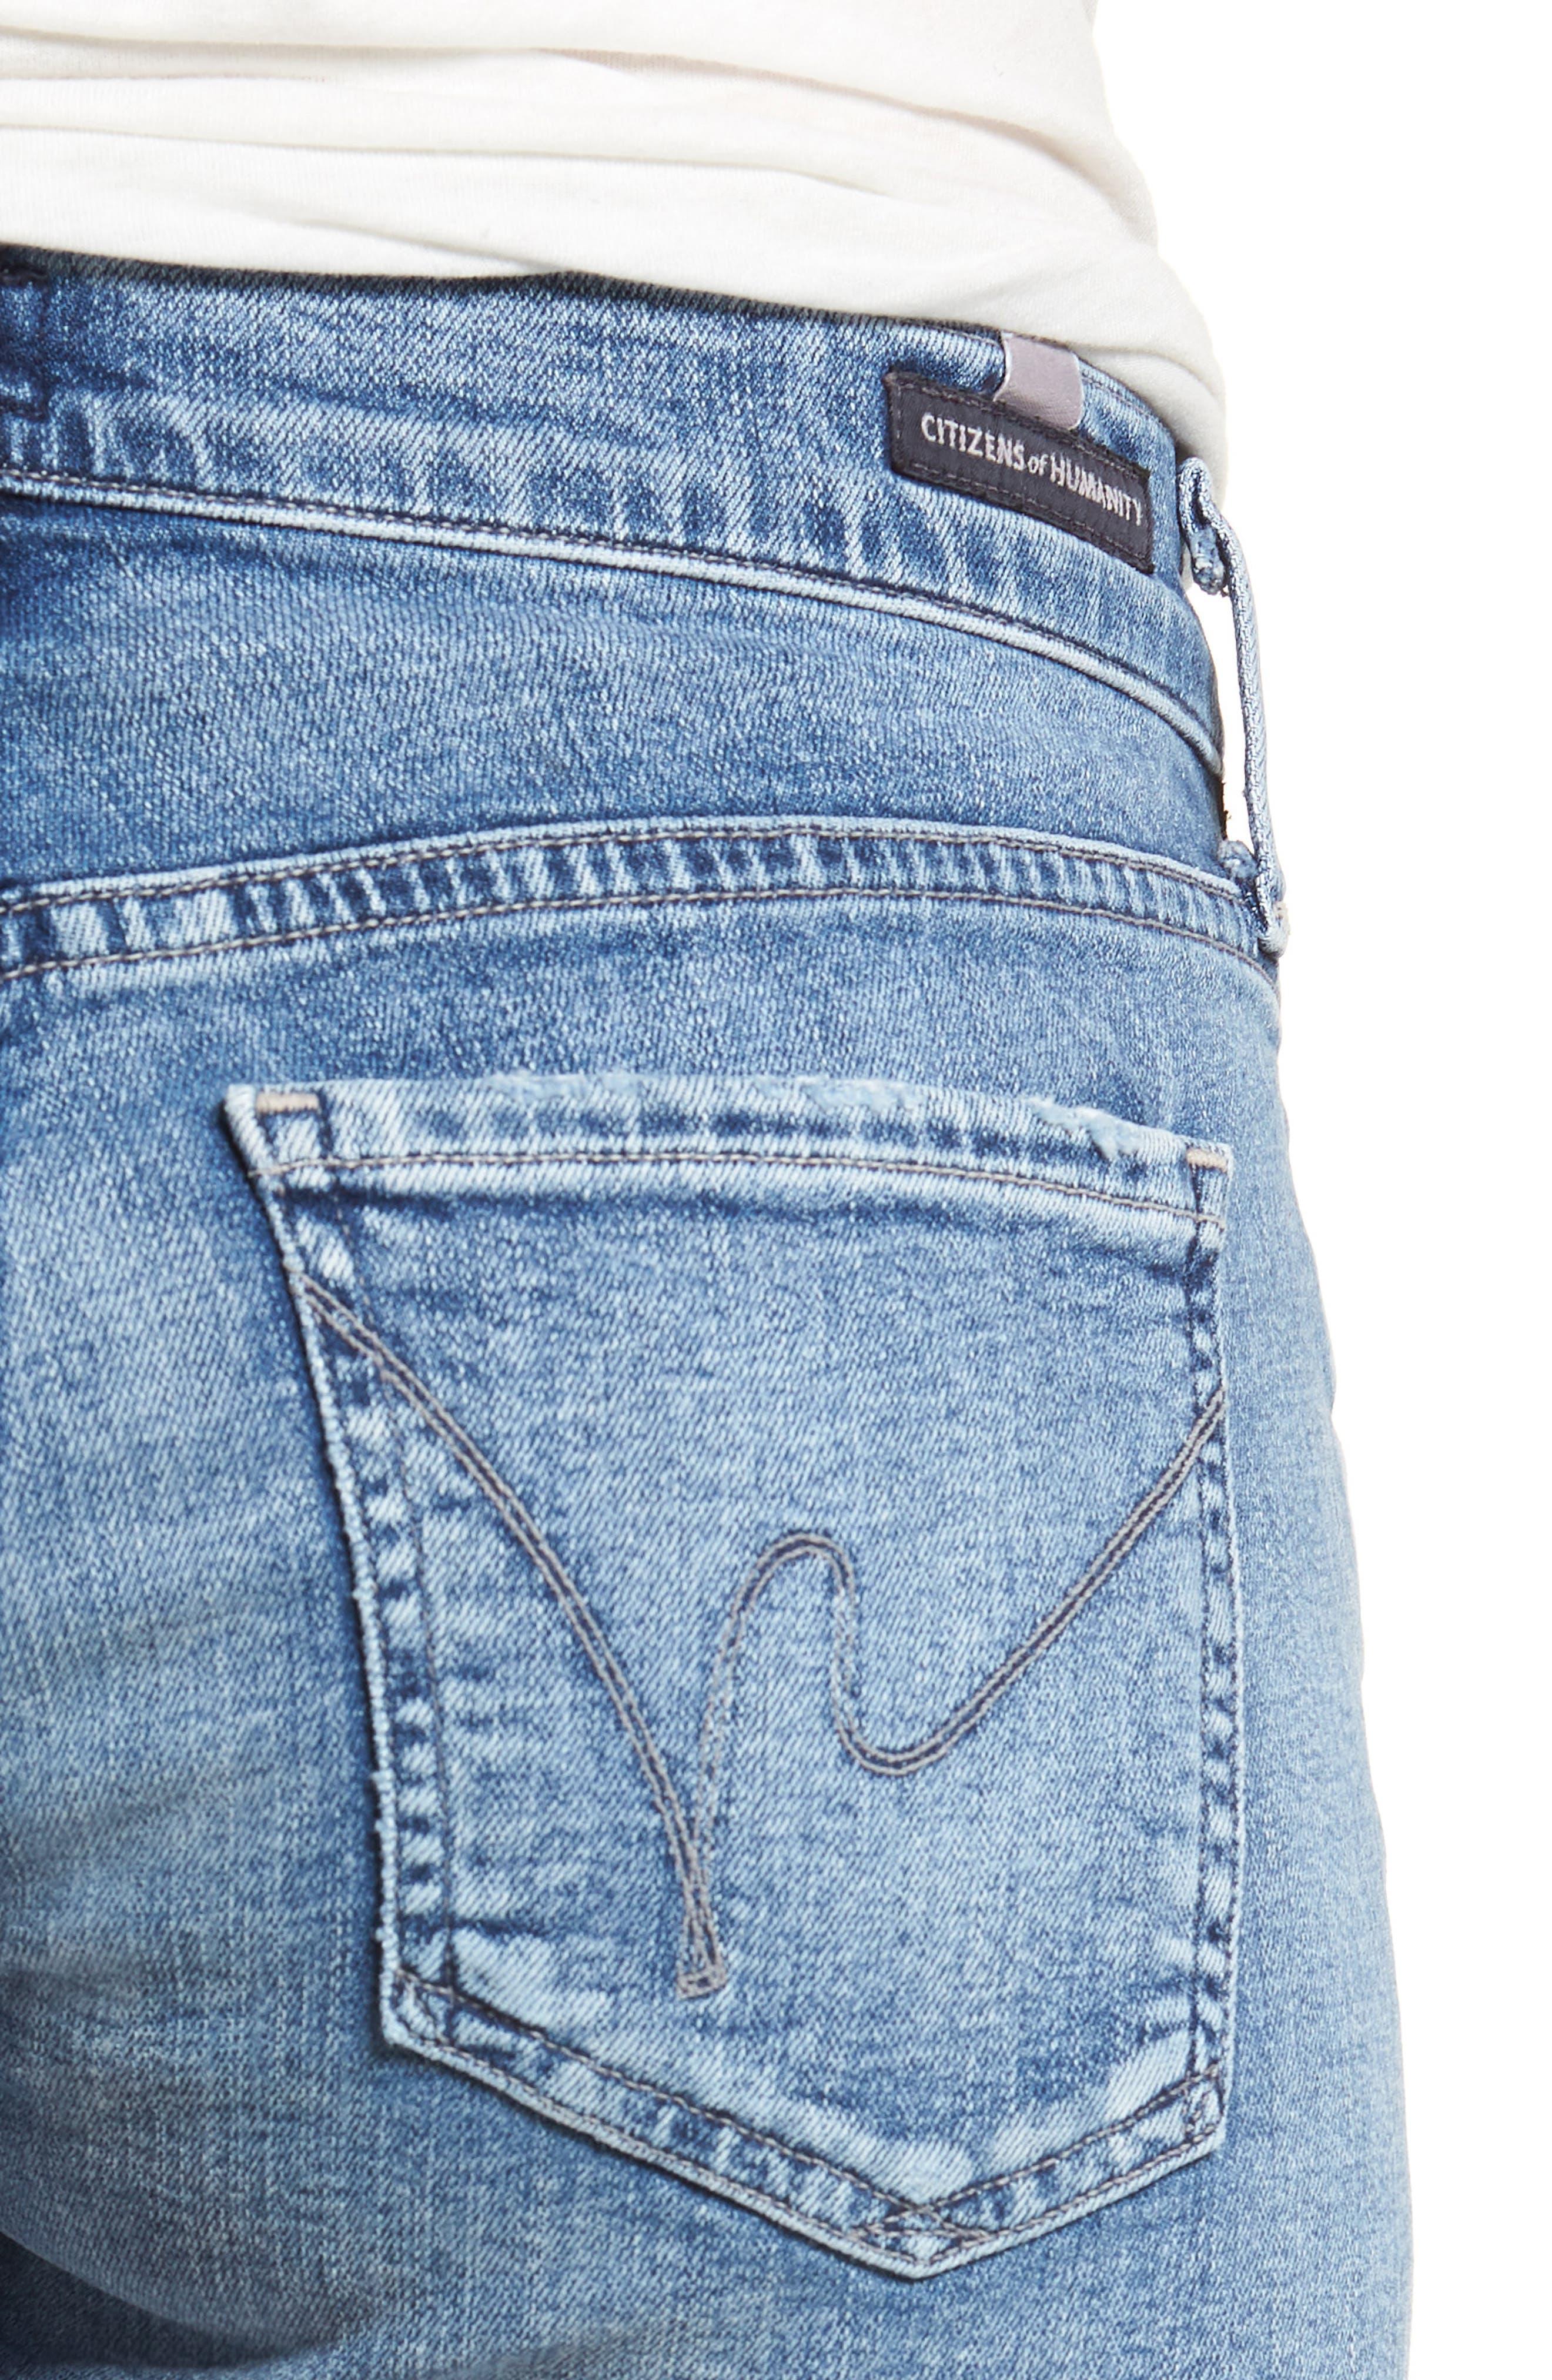 Ava Cutoff Denim Shorts,                             Alternate thumbnail 4, color,                             Pacifica